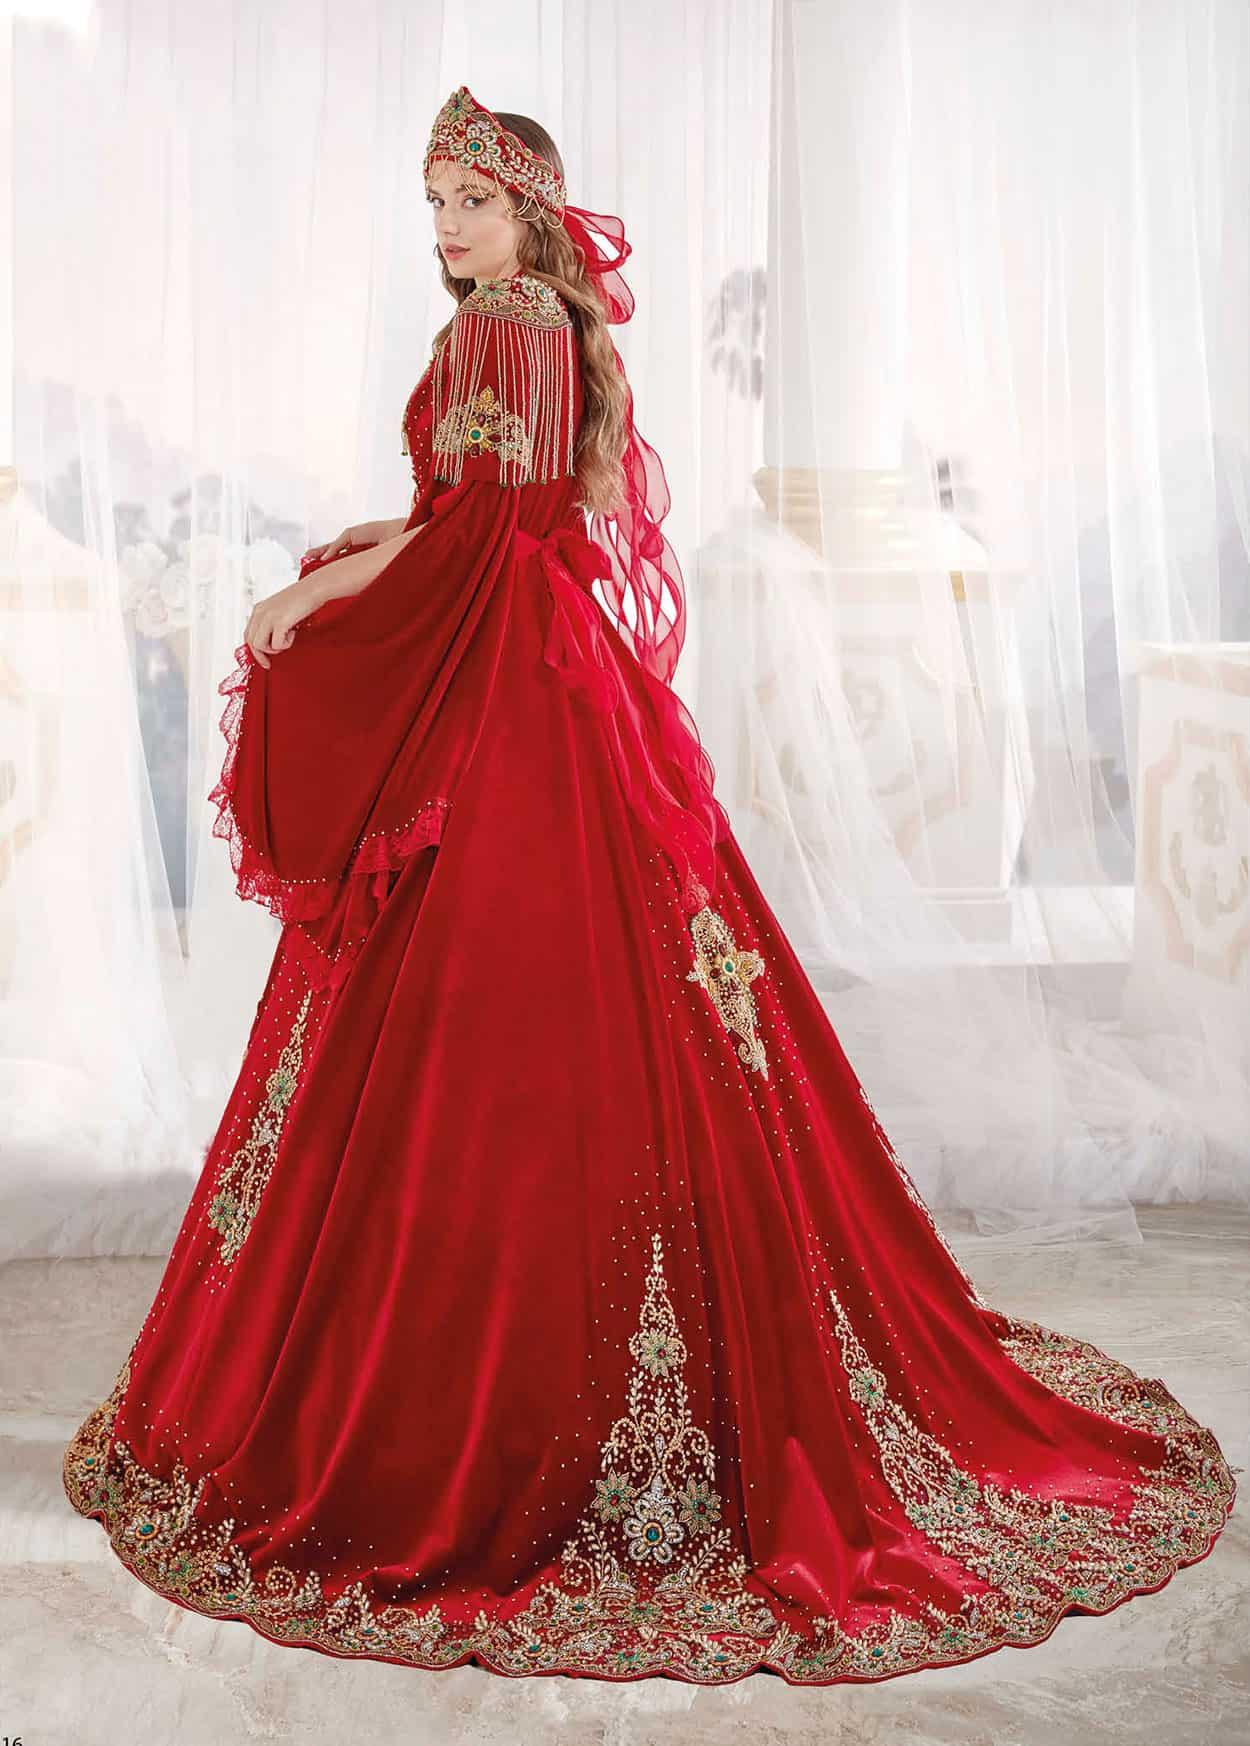 7b25430cec best turkish dresses. Luxury exclusive Chic Caftan Set Velvet Delicate  Sequins buy online evening dress shopping maxi dress online